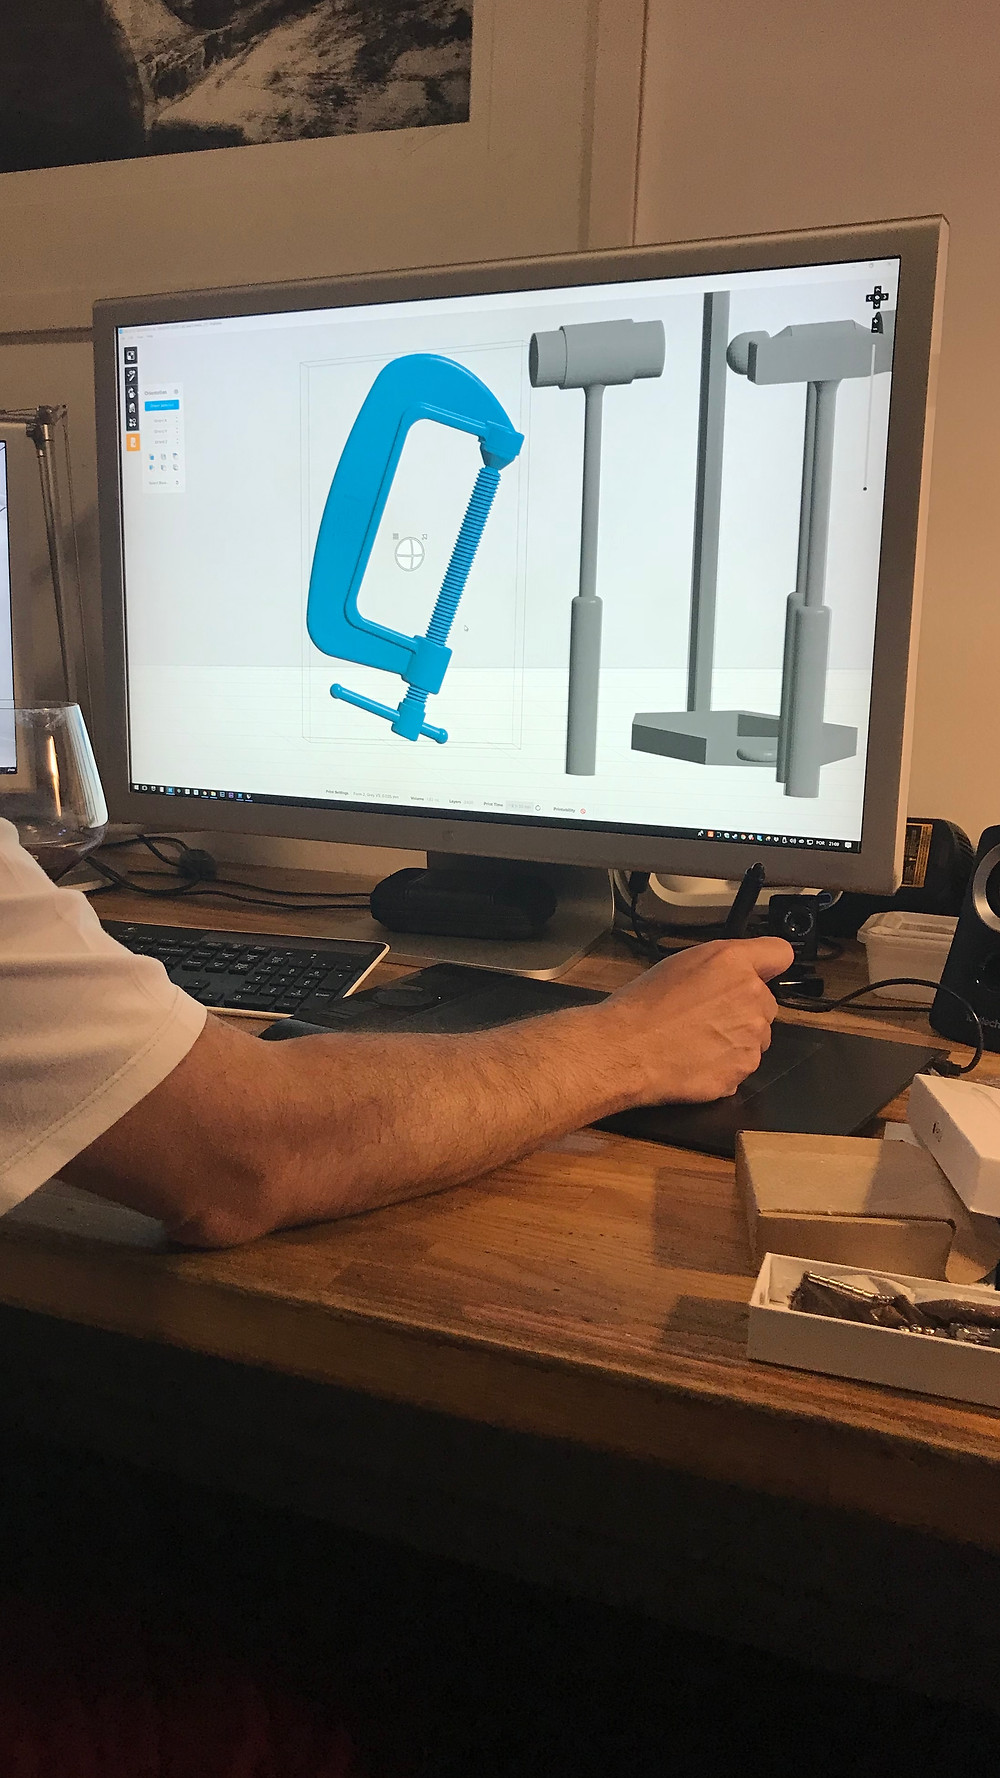 Ripa   Impressão 3D